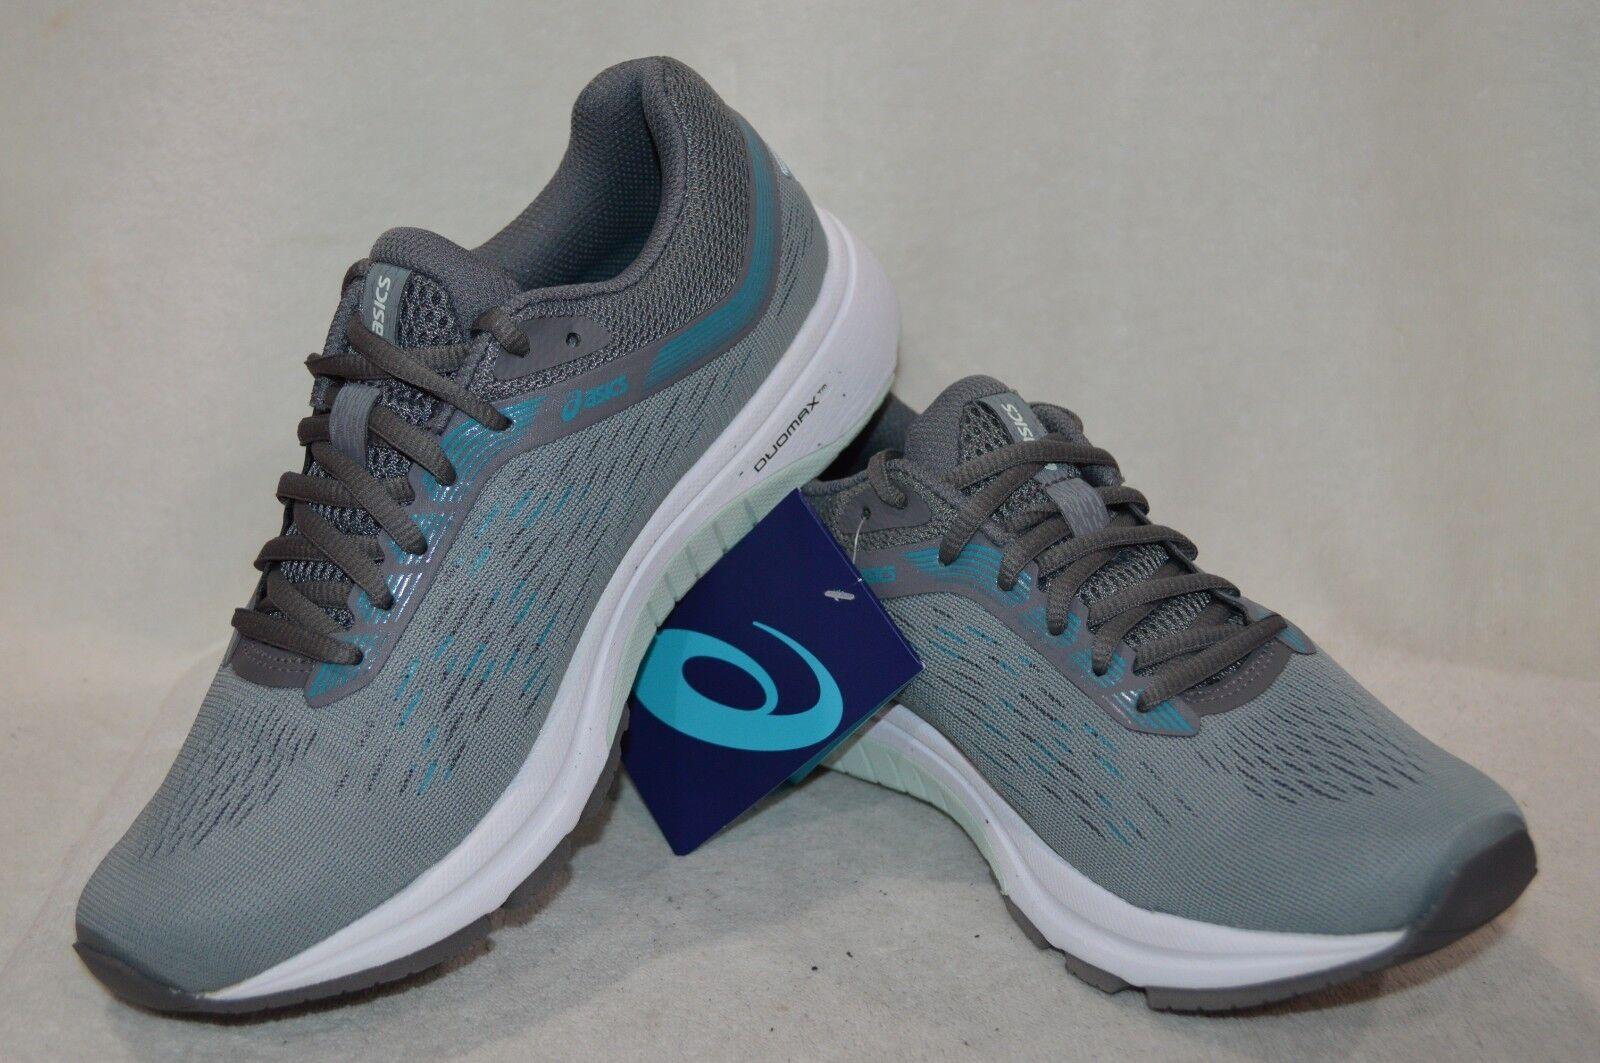 ASICS Femme GT-1000 7 Stone  Gris /Carbon Running Chaussures -